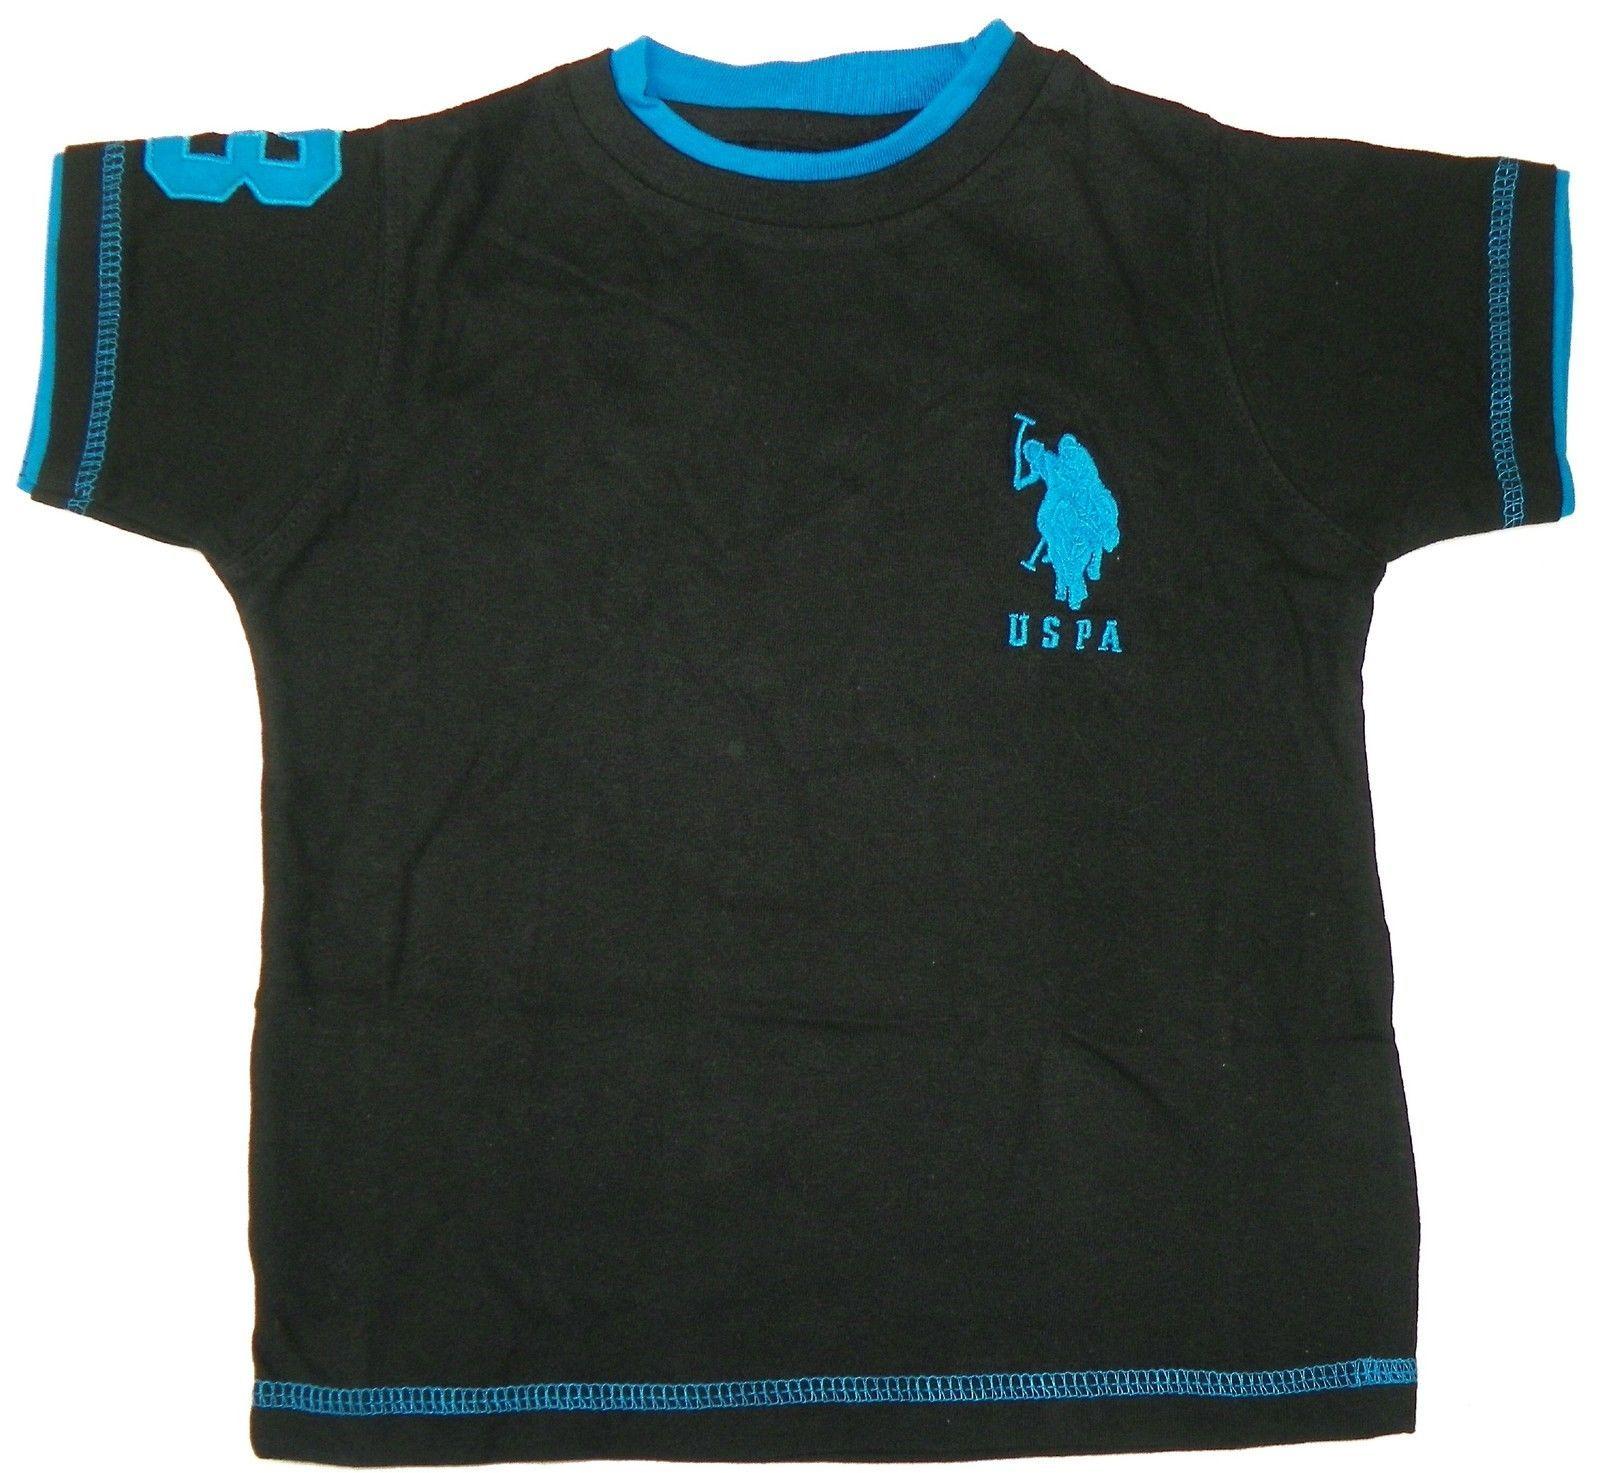 Size 5/6 U.S. Polo Assn. Shirt Boy's Double Crew Tee Black with Blue Logo